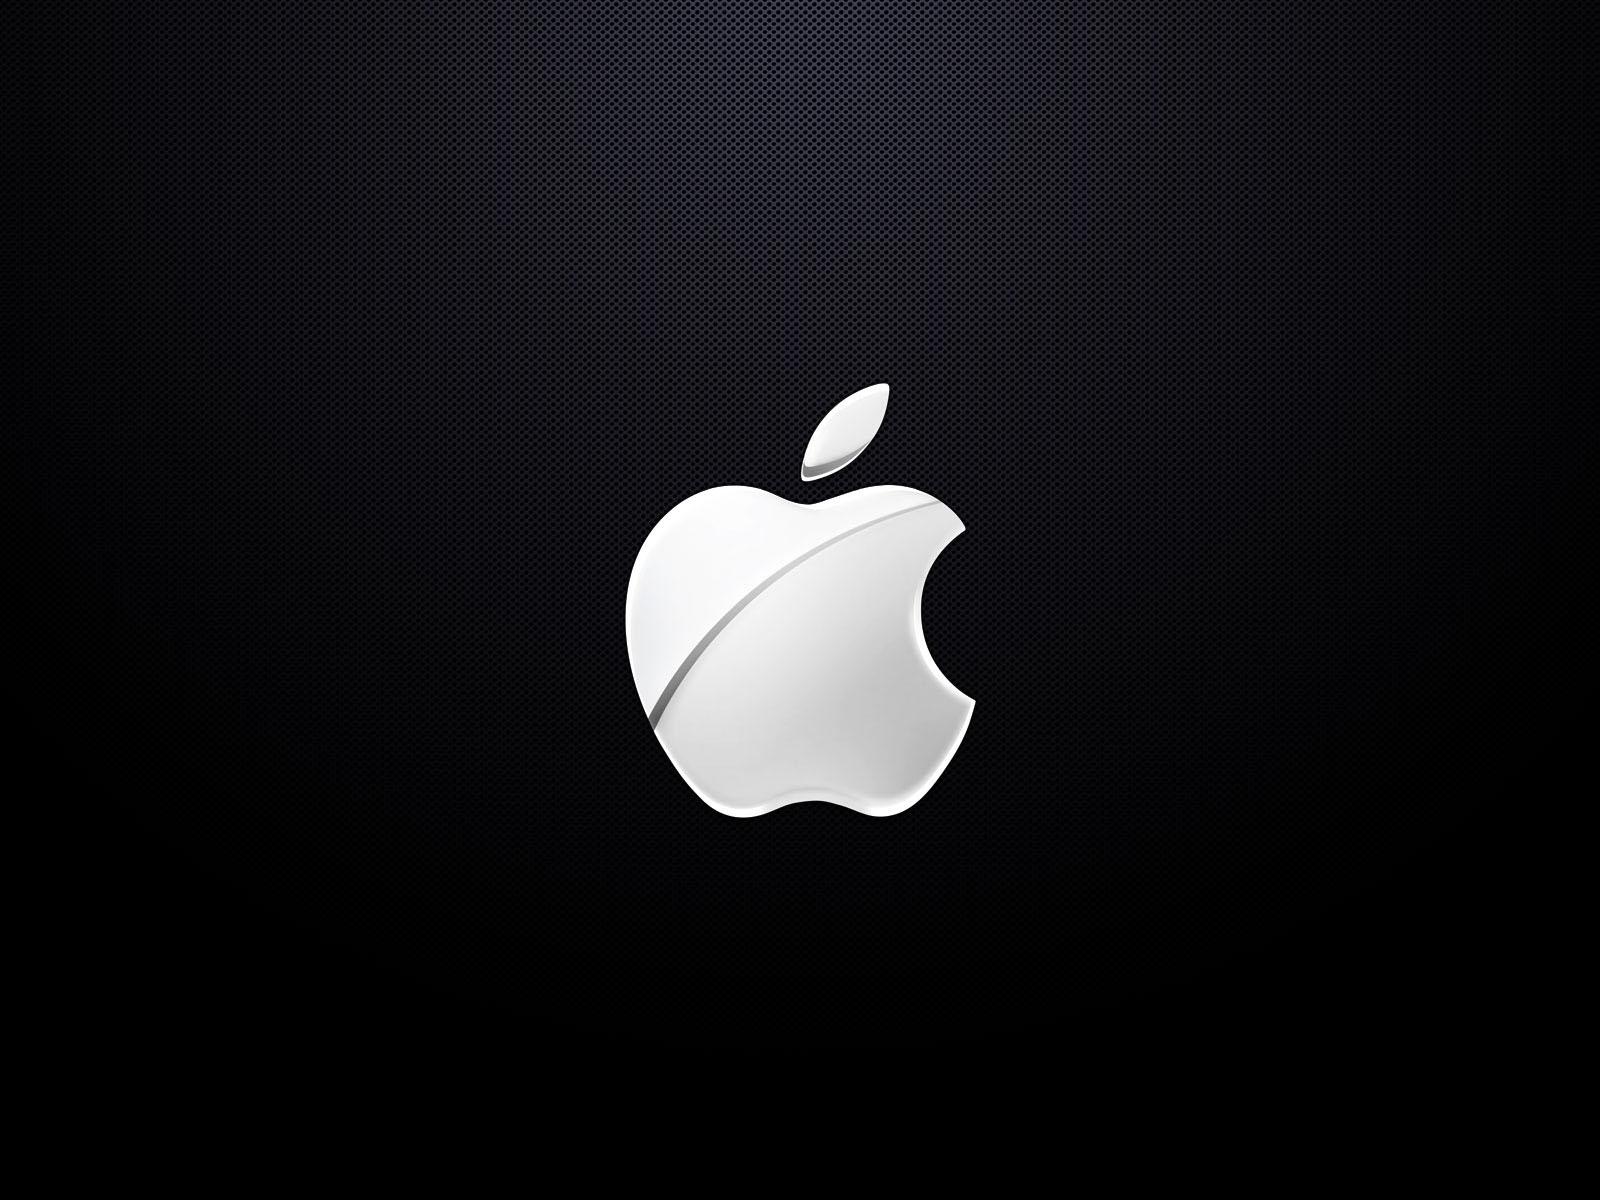 wallpapers: Apple Logo Wallpapers